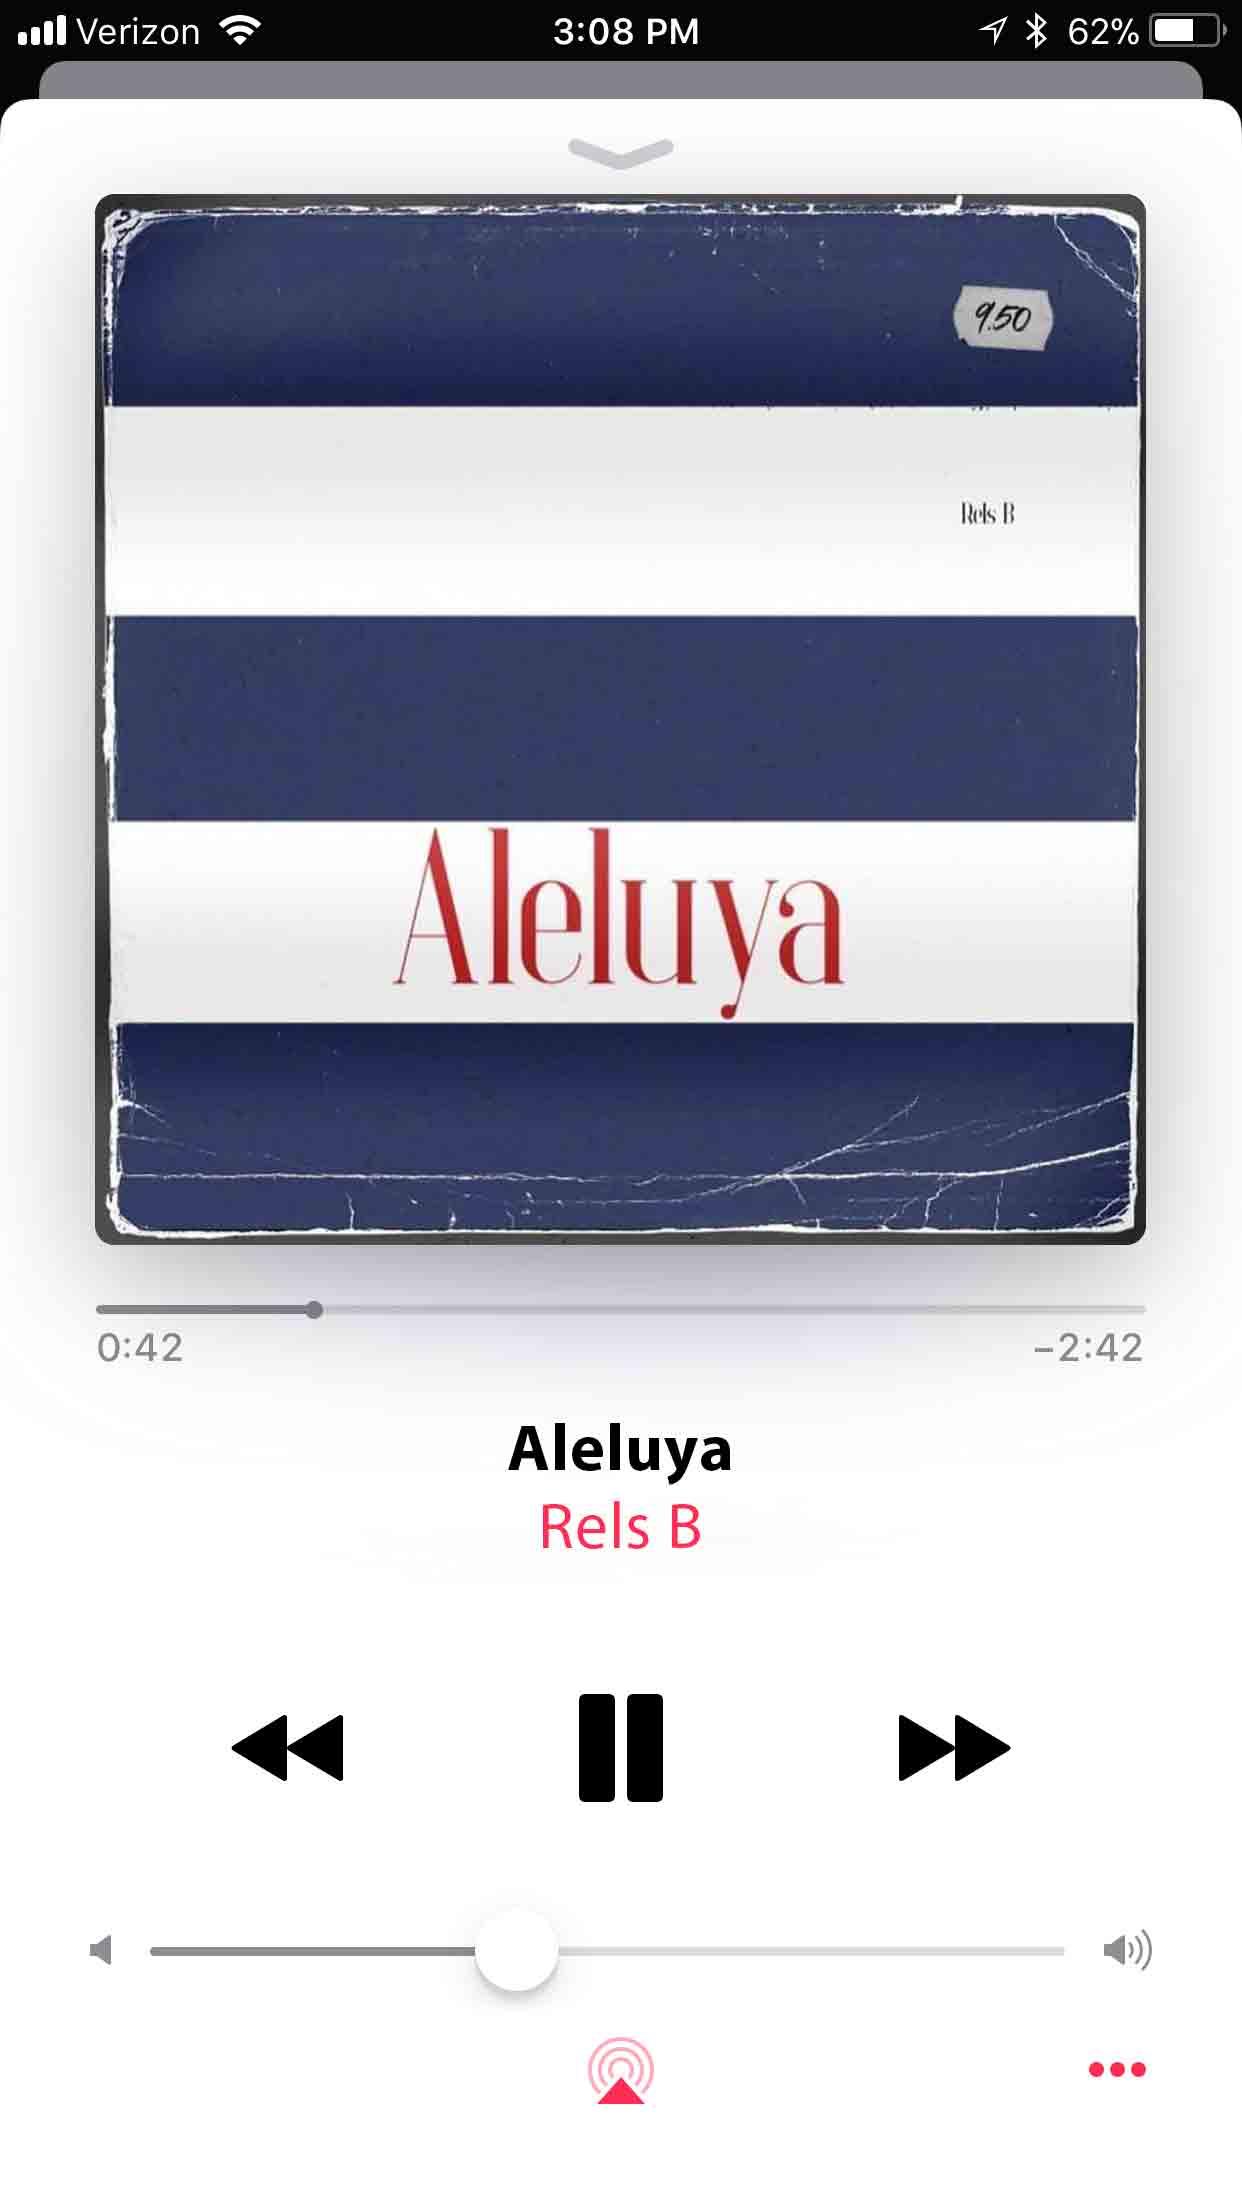 Apple-Music-Mockup-RelsB-Rels-B-Disco-portada